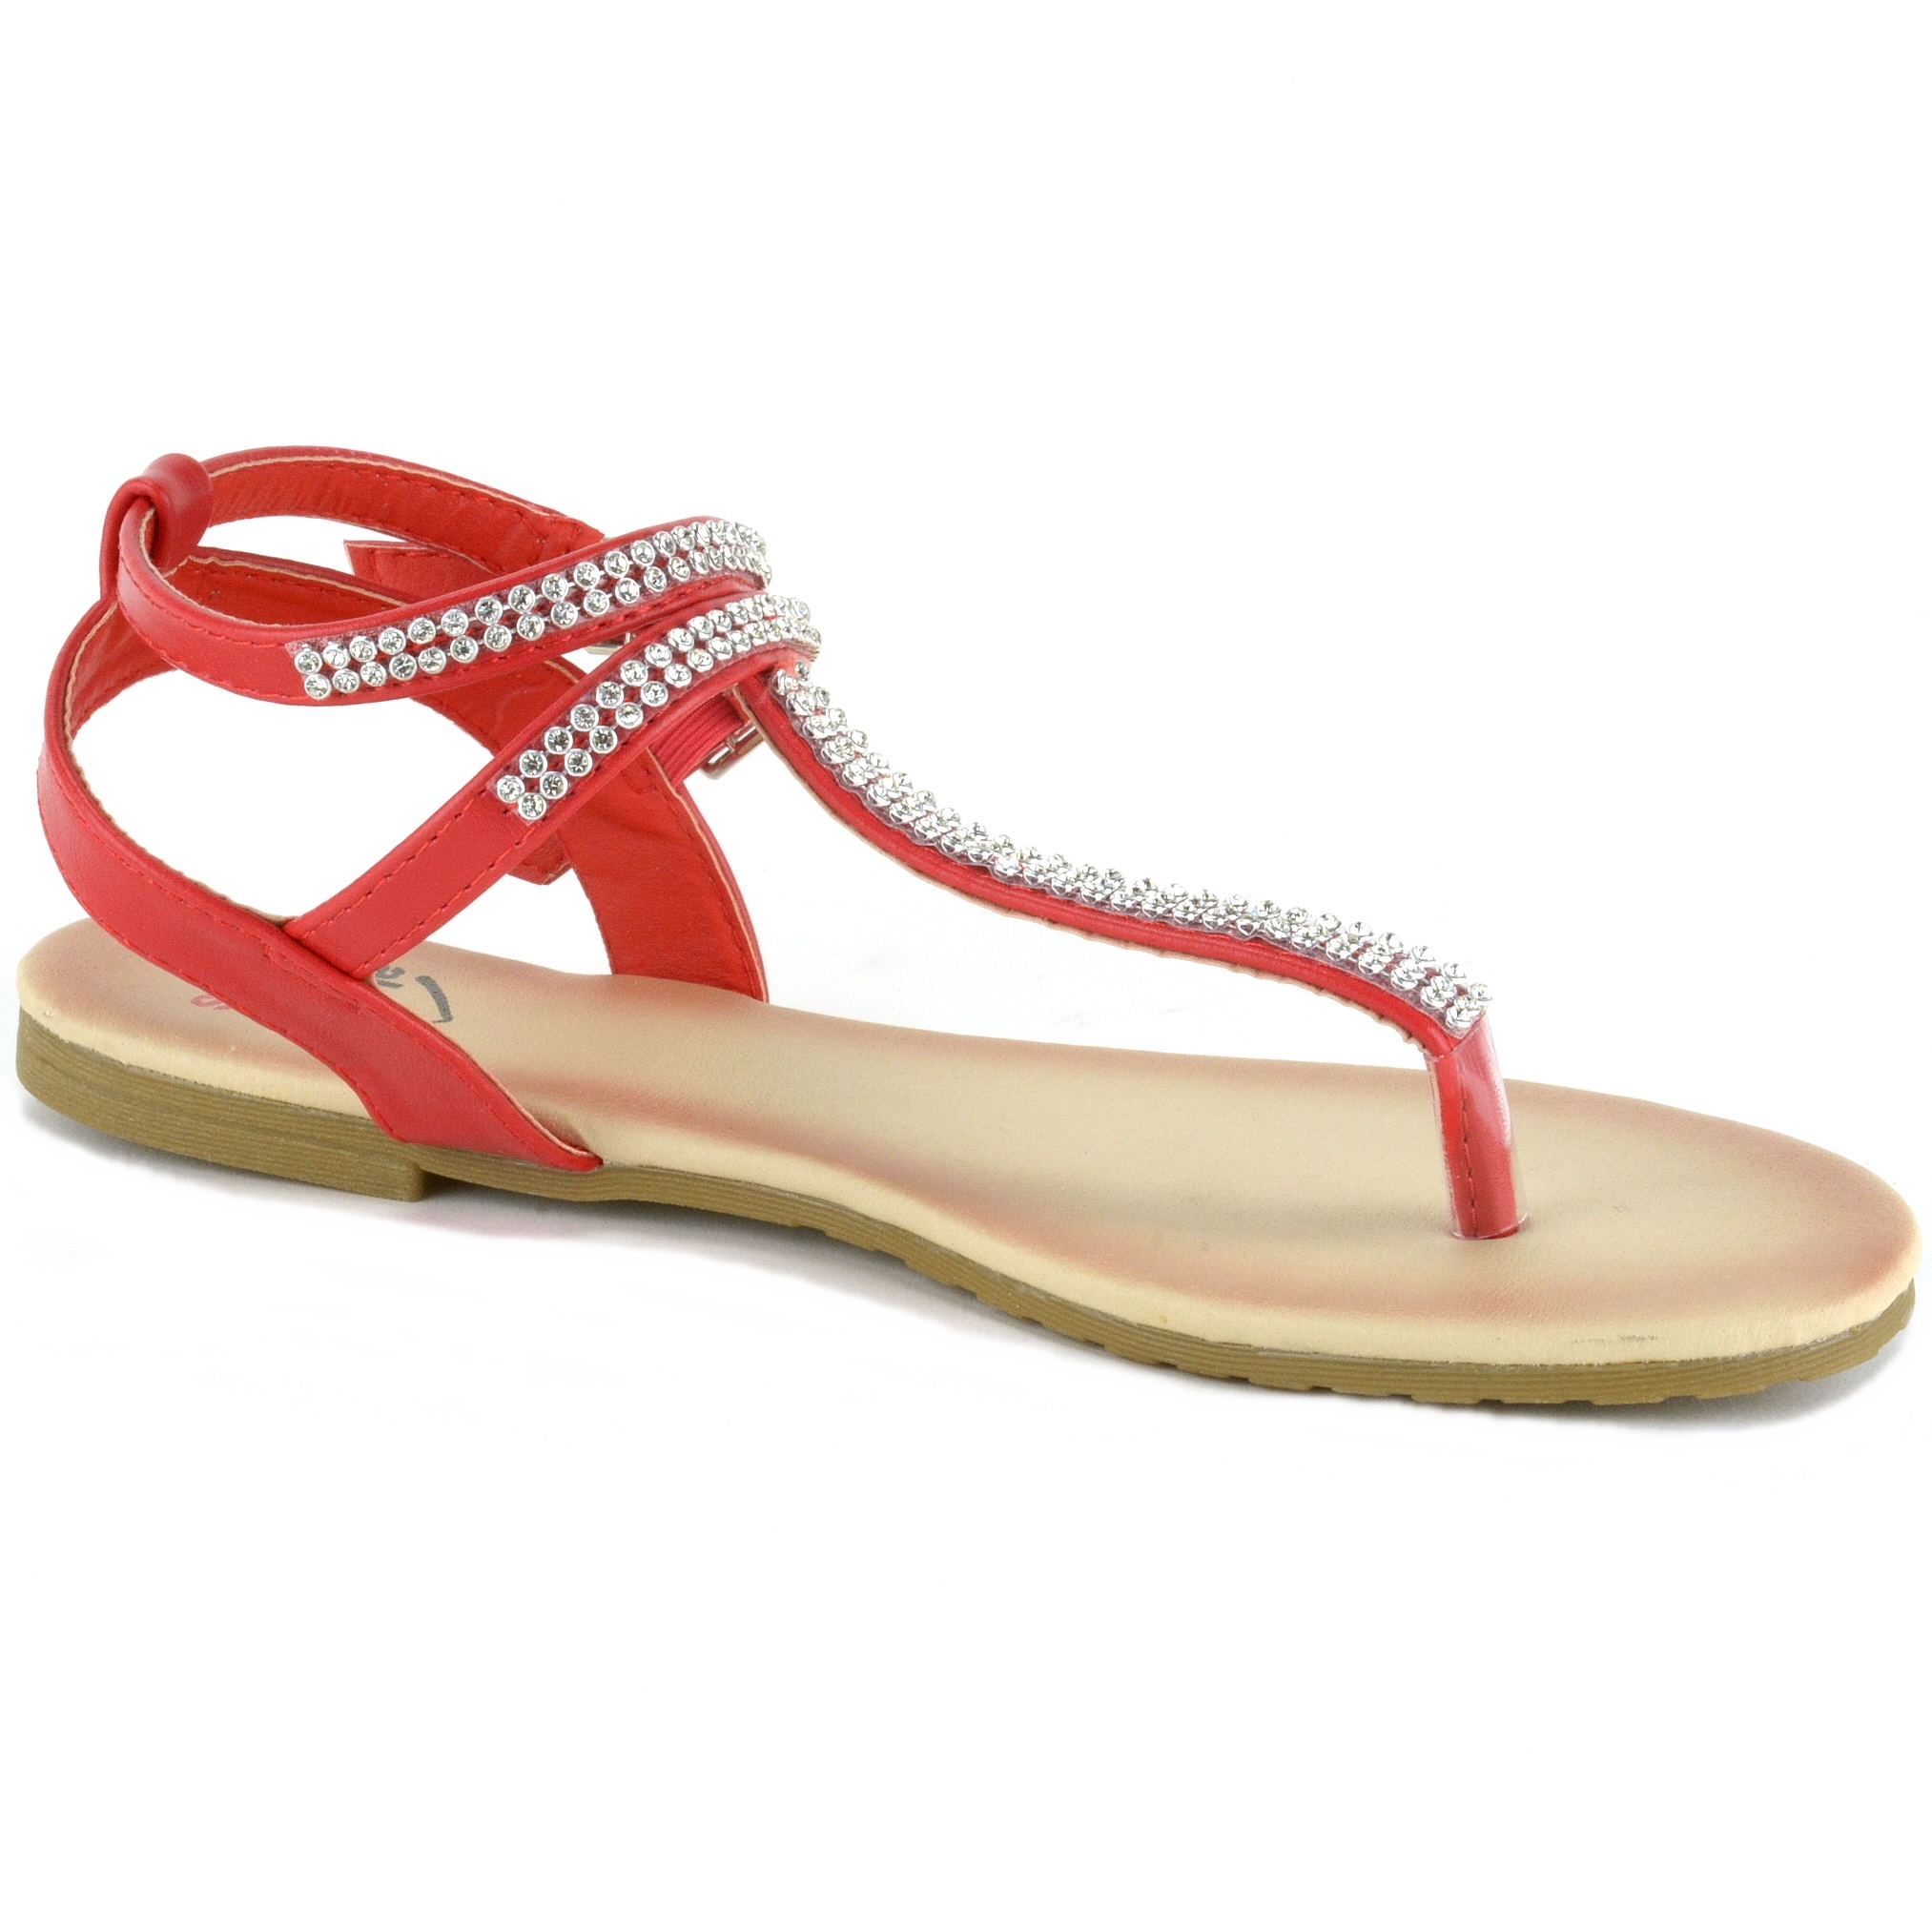 8e0bc38447ac Alpine Swiss Womens Gladiator Sandals T-Strap Slingback Roman ...